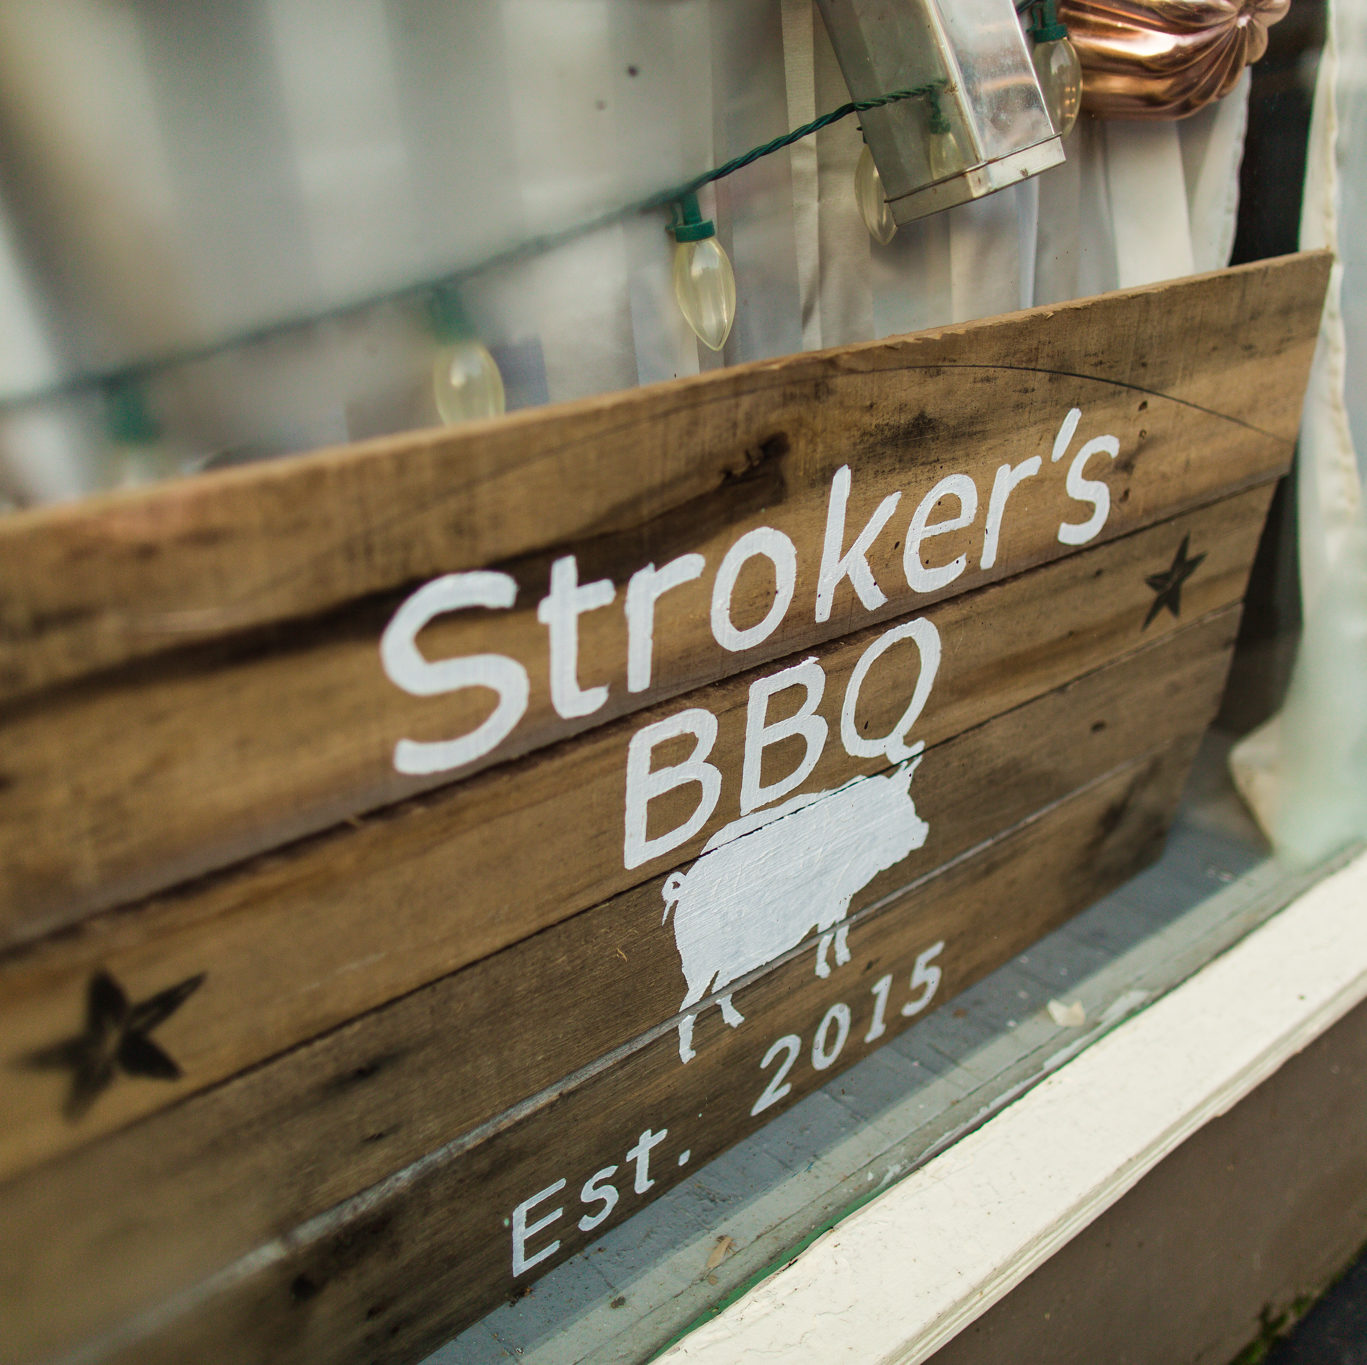 Stroker's BBQ